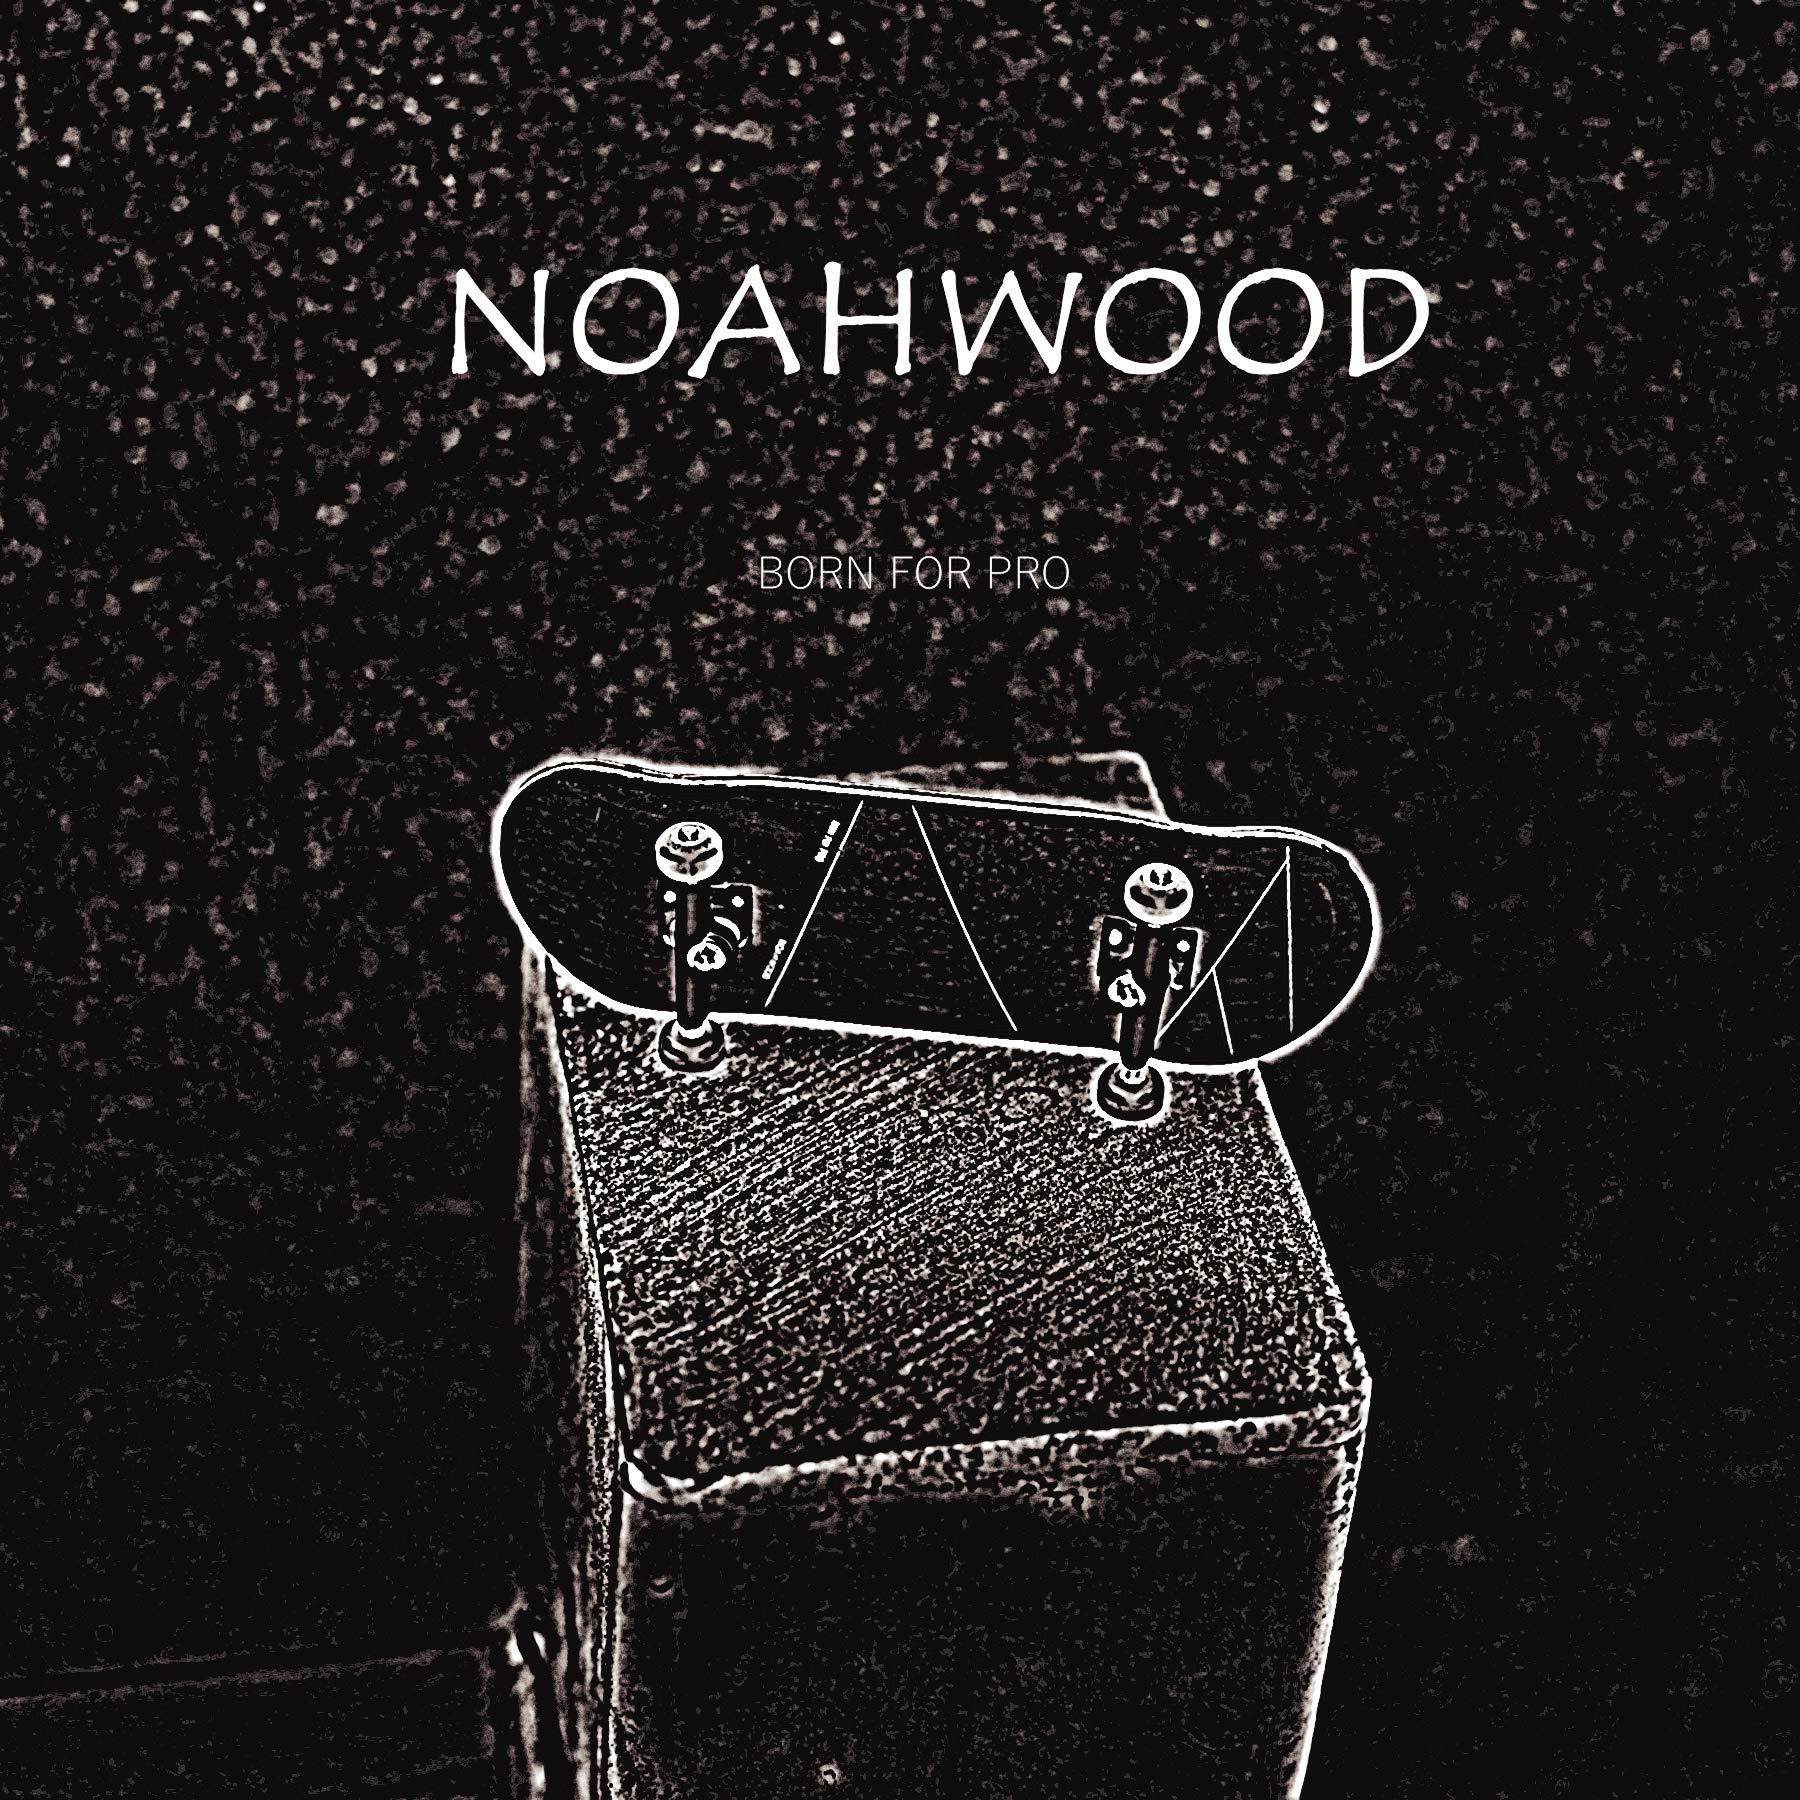 NOAHWOOD Wooden PRO Fingerboards (Deck,Truck,Wheel / a Set) (Born for PRO) by NOAHWOOD (Image #9)